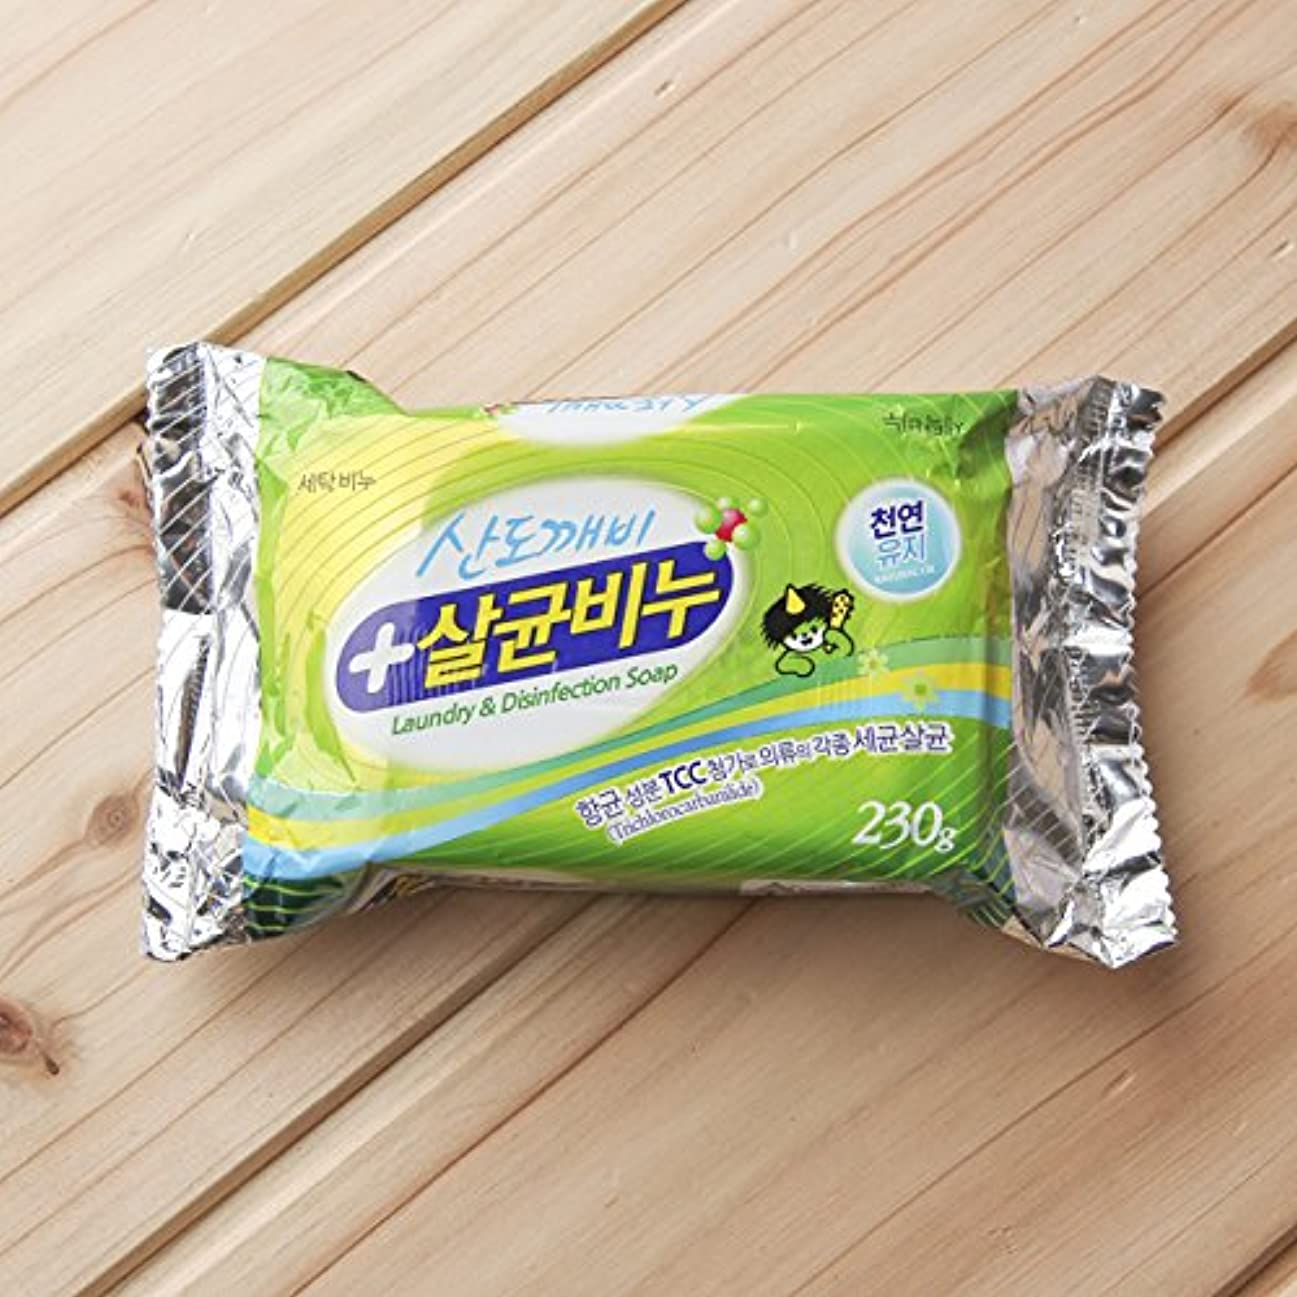 VBMDoM 滅菌石鹸(230g)ワイシャツ 下着 子供洗濯 韓国製品 x 2個 [並行輸入品]